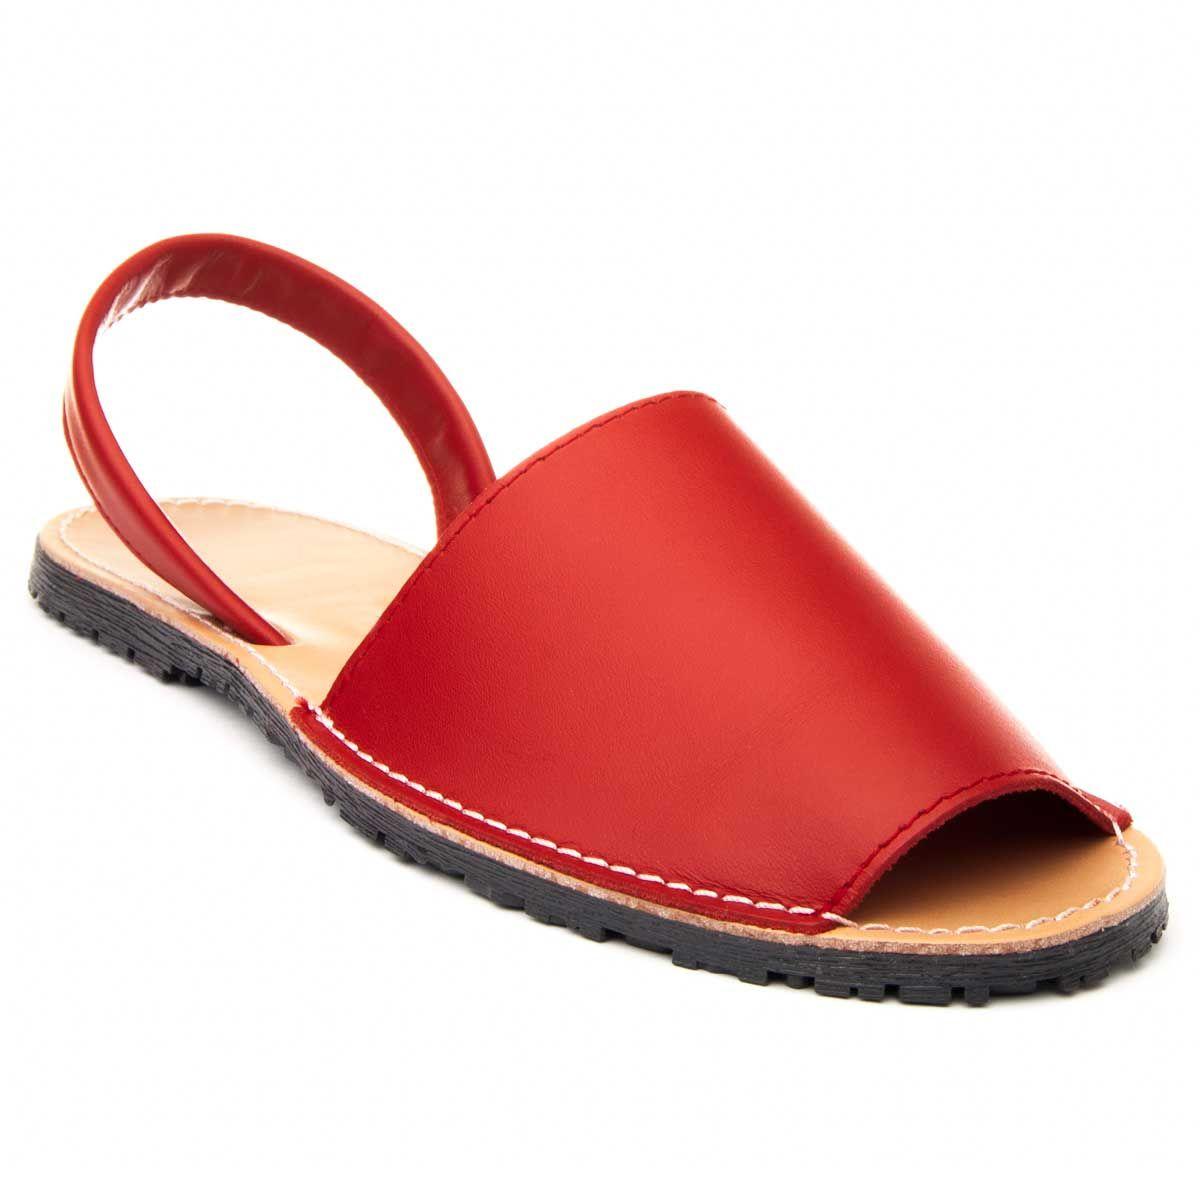 Purapiel Slingback Flat Sandal in Red